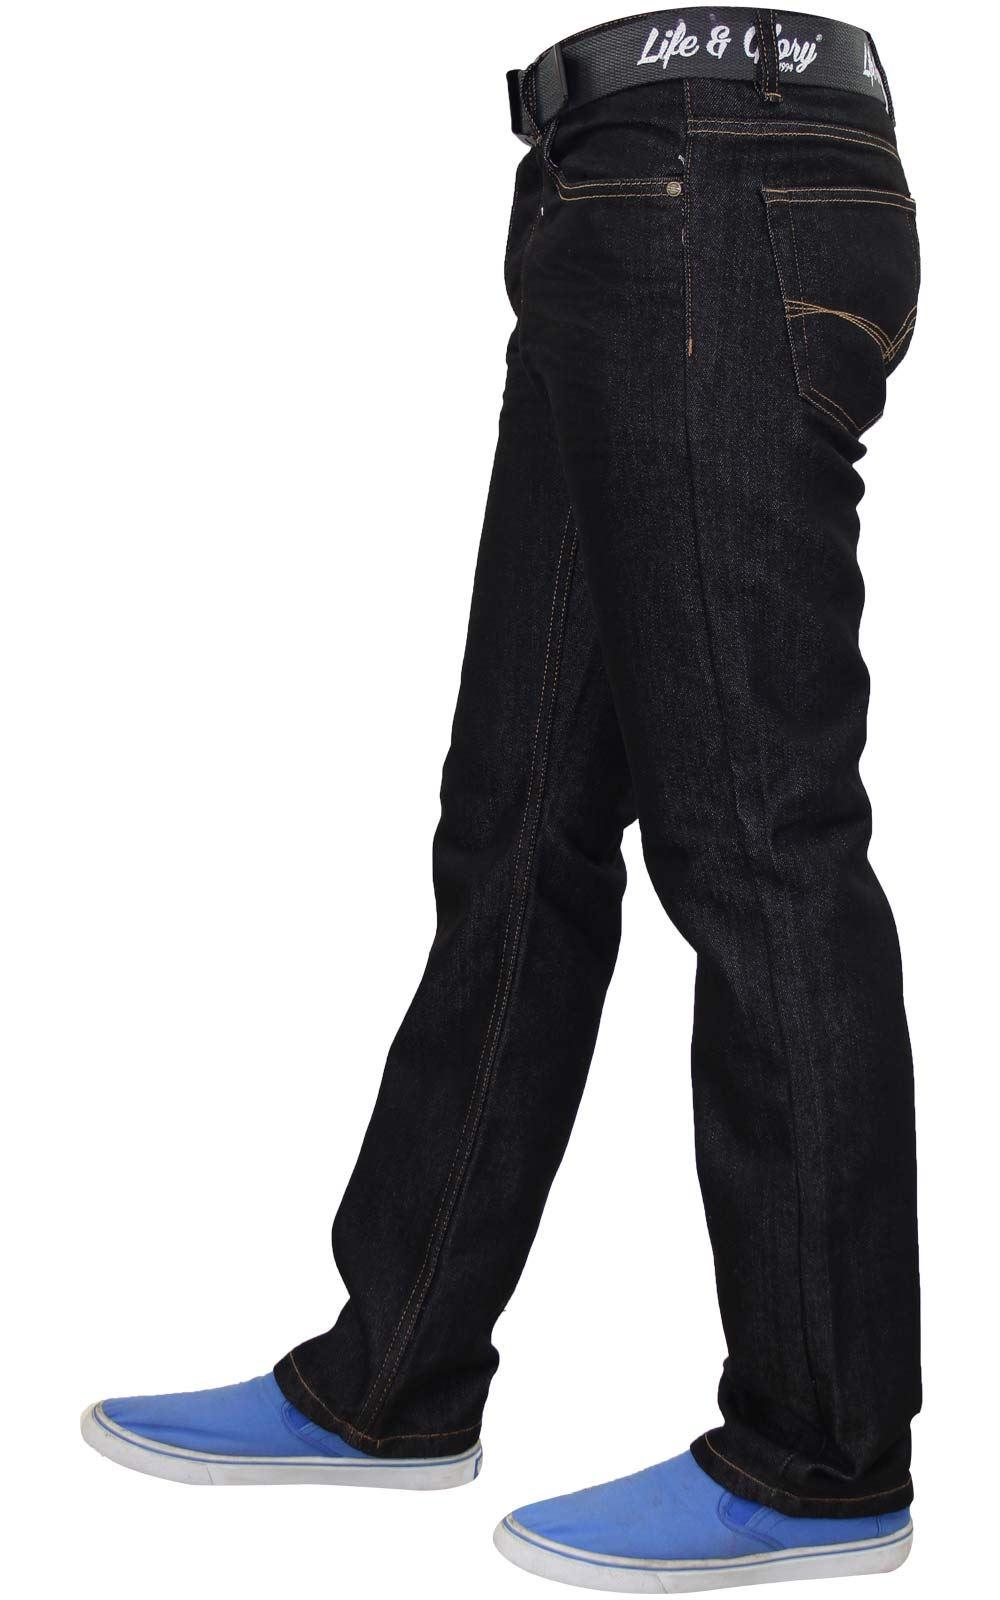 Men-Regular-Fit-Jeans-Denim-Button-Fly-Straight-Leg-Trouser-Pant-With-Free-Belt thumbnail 5